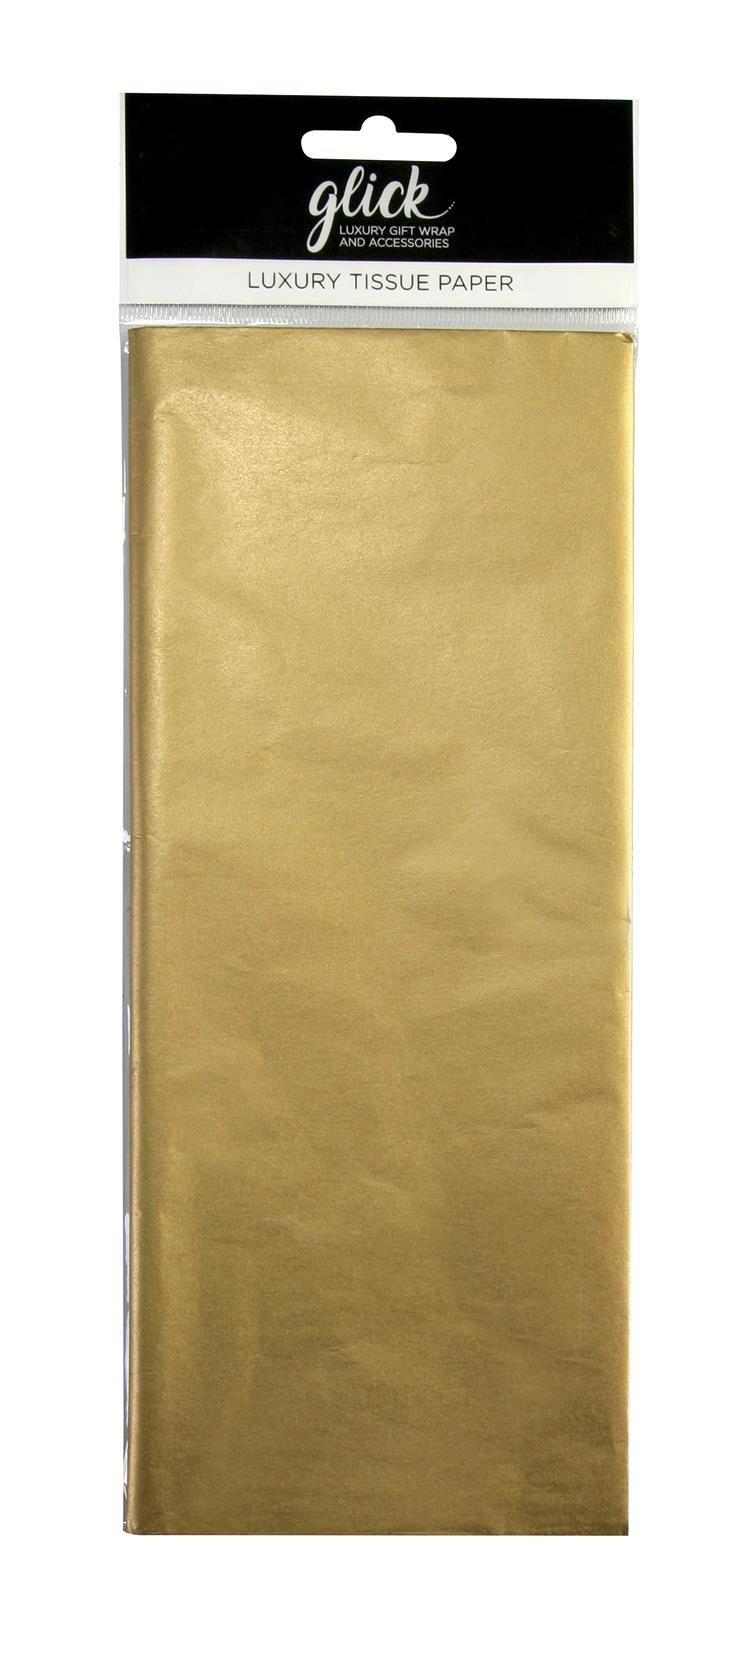 Metallic Gold Luxury Tissue Paper - Pack Of 4 - Luxury TISSUE Paper - GIFT